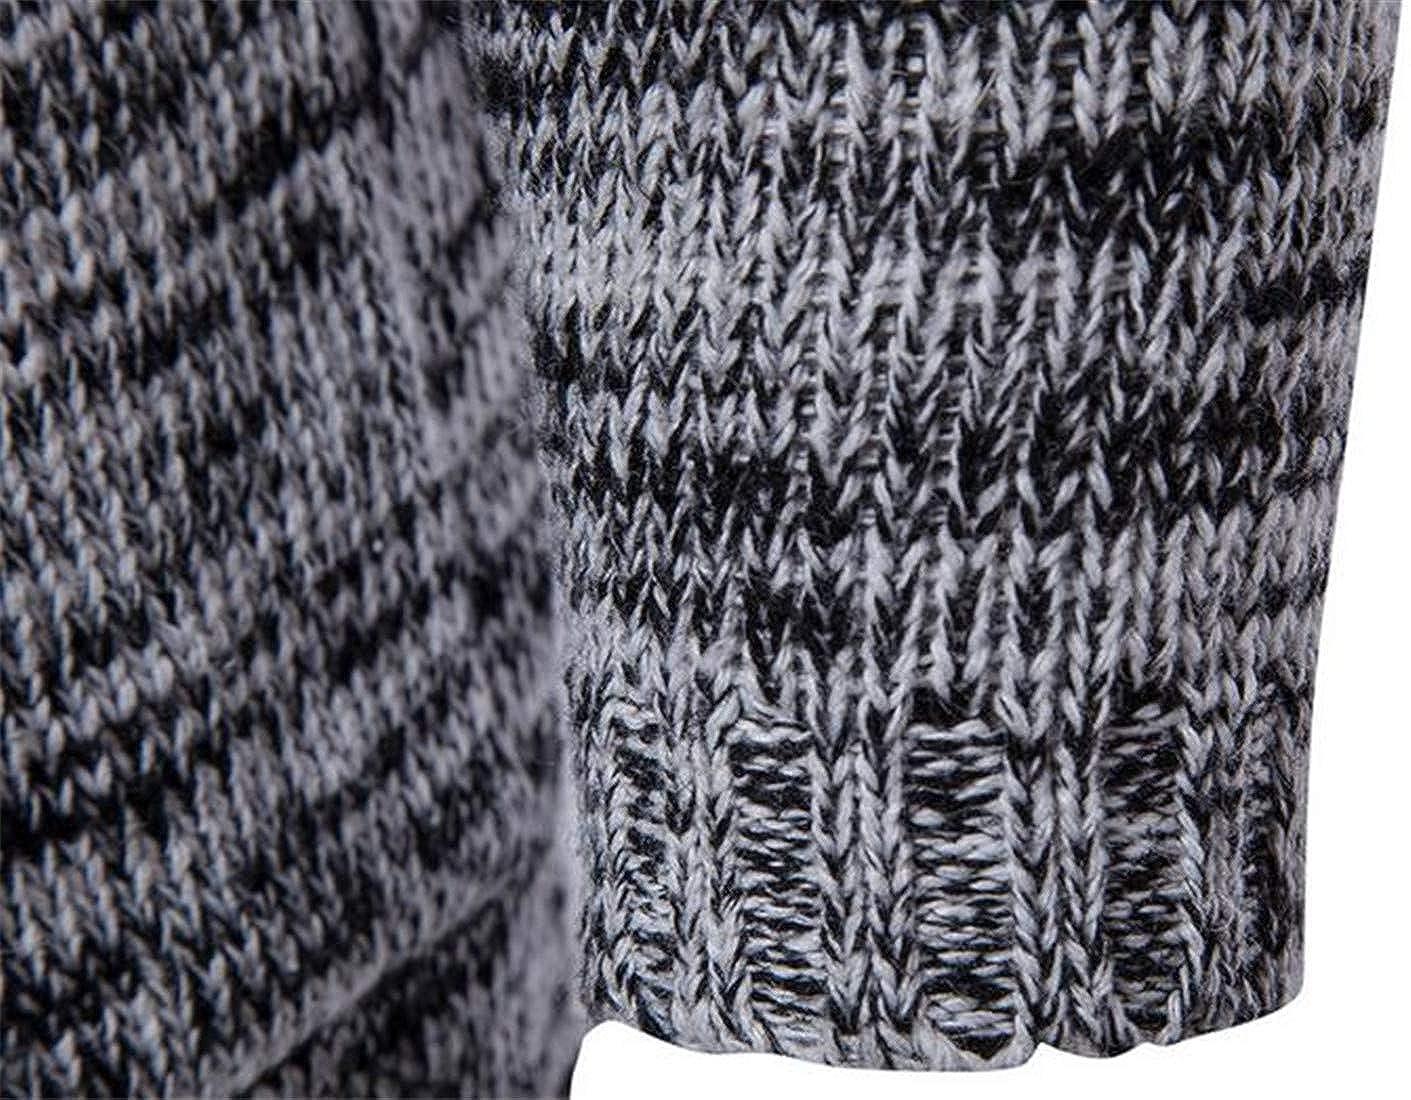 XiaoTianXinMen XTX Mens Autumn Sweater Knitwear Hooded Pocket Open Front Cardigan